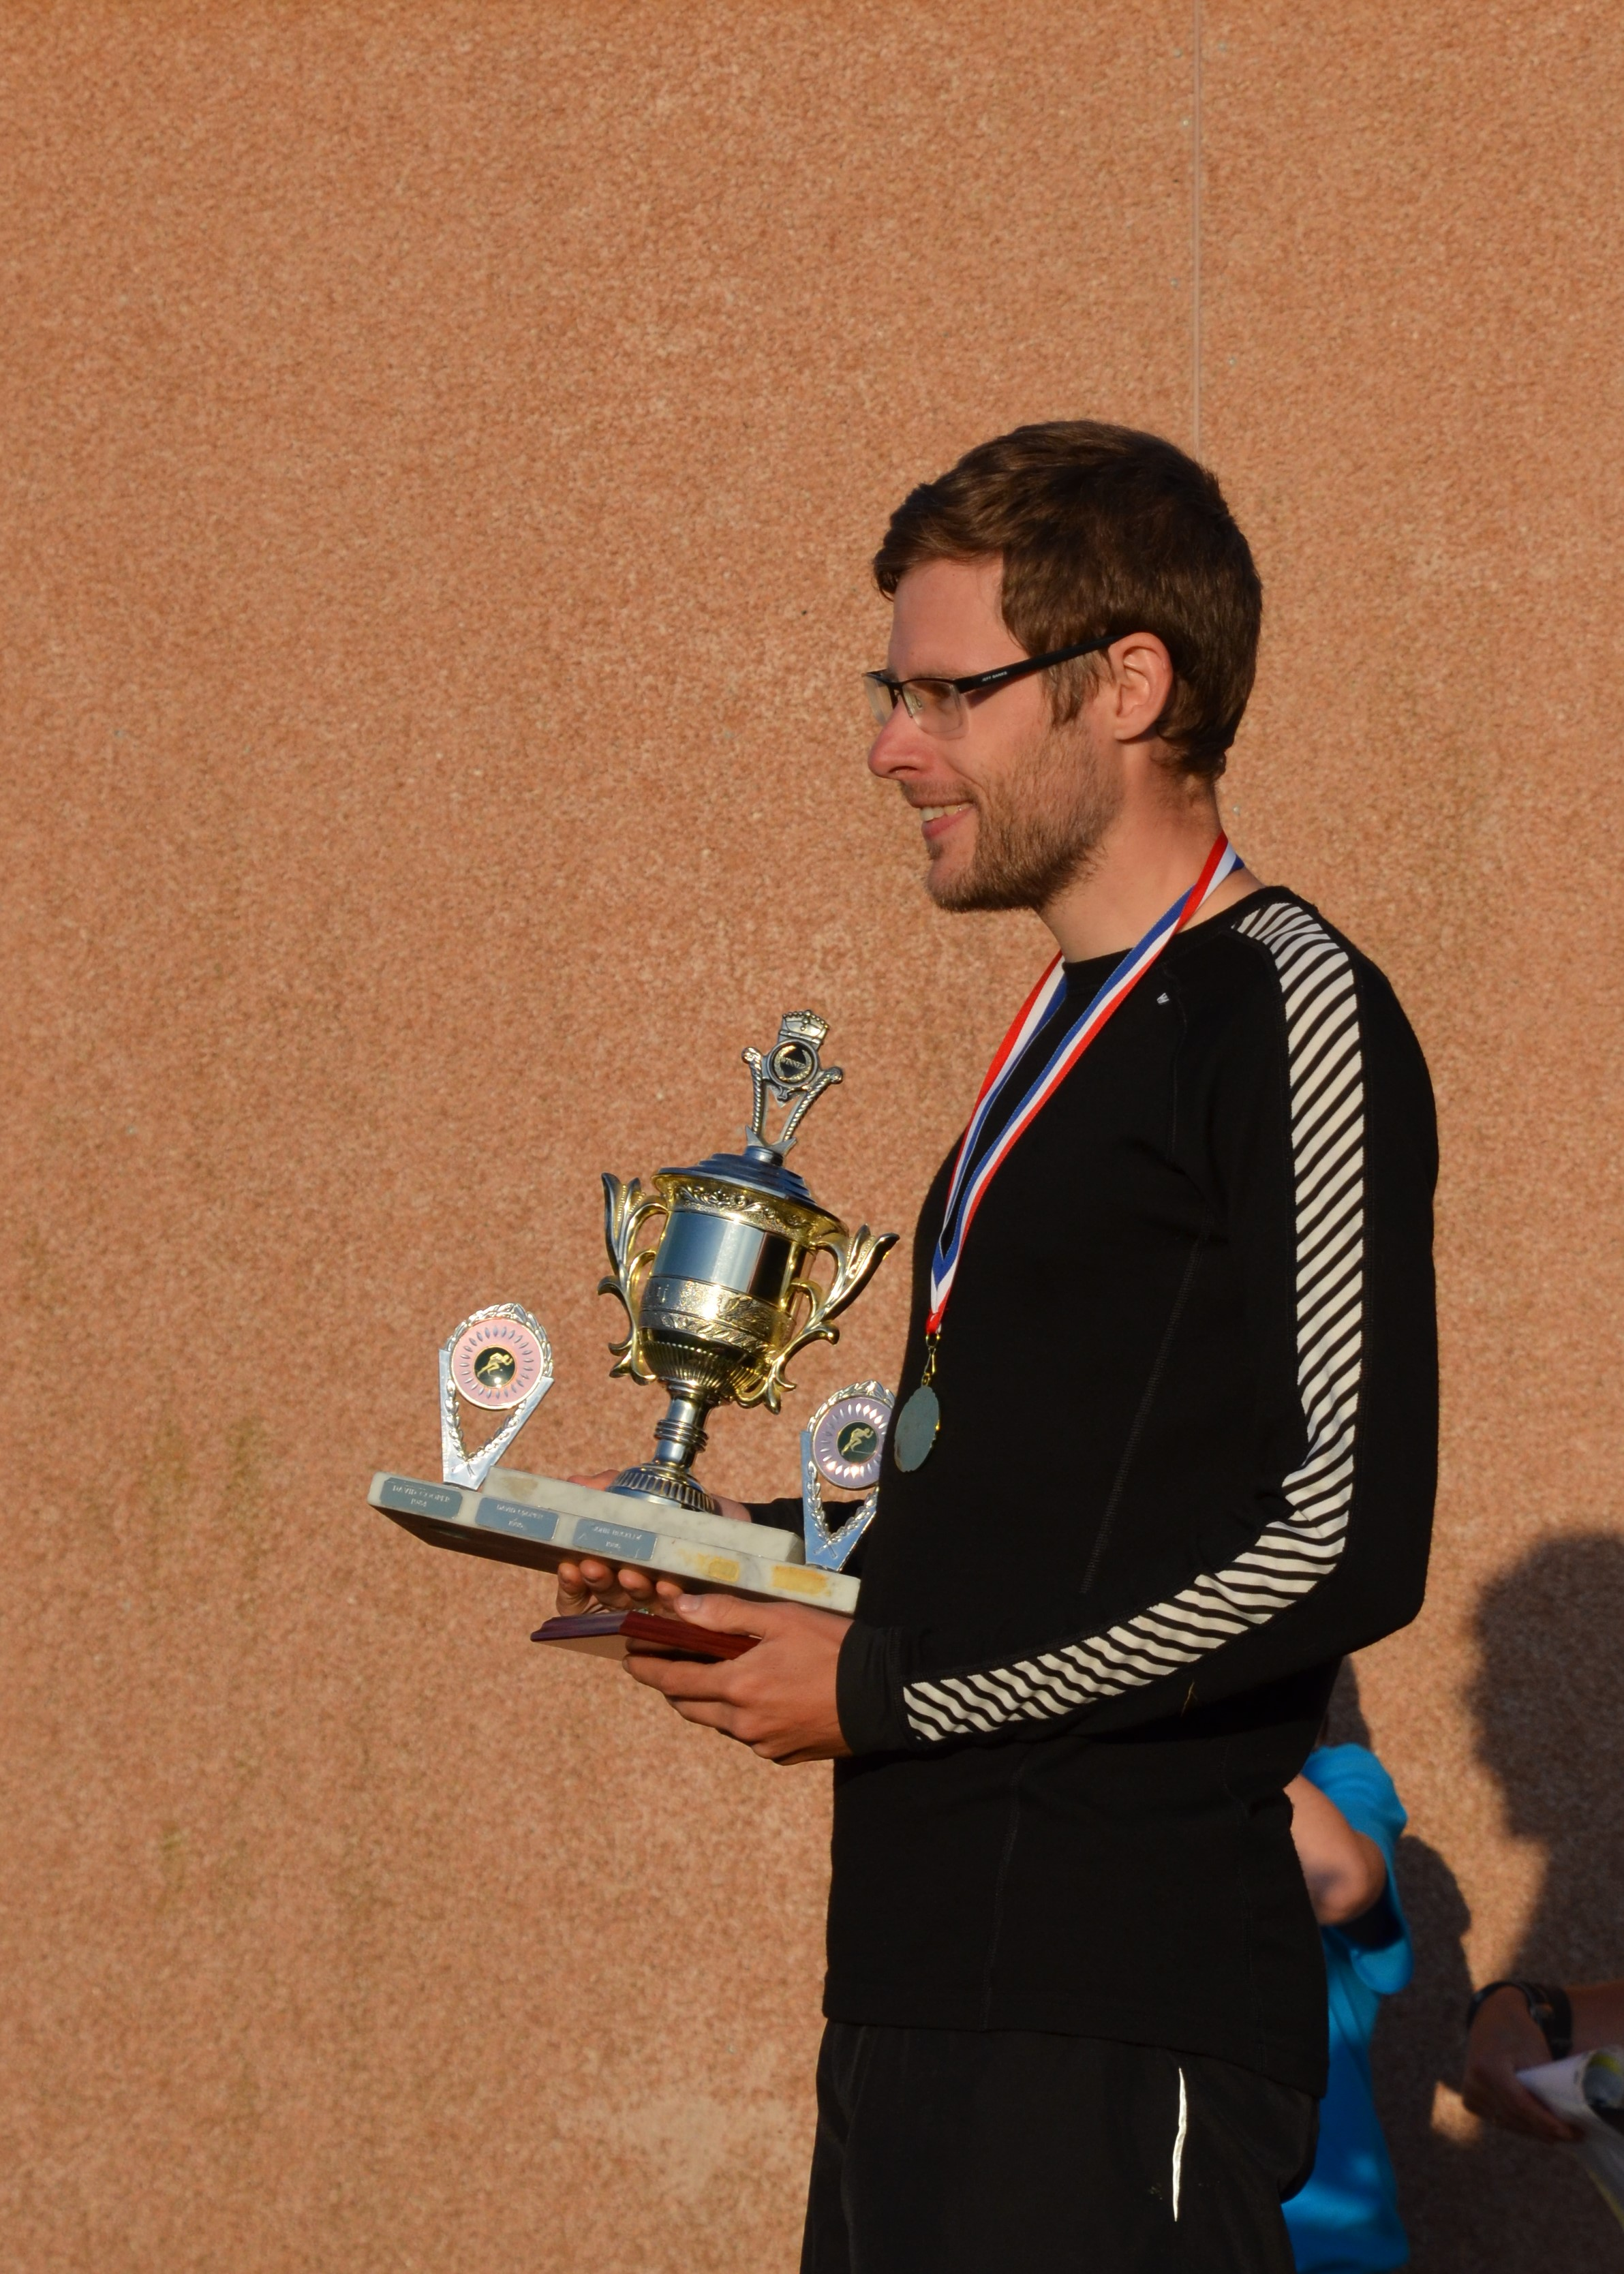 Winner holding trophy